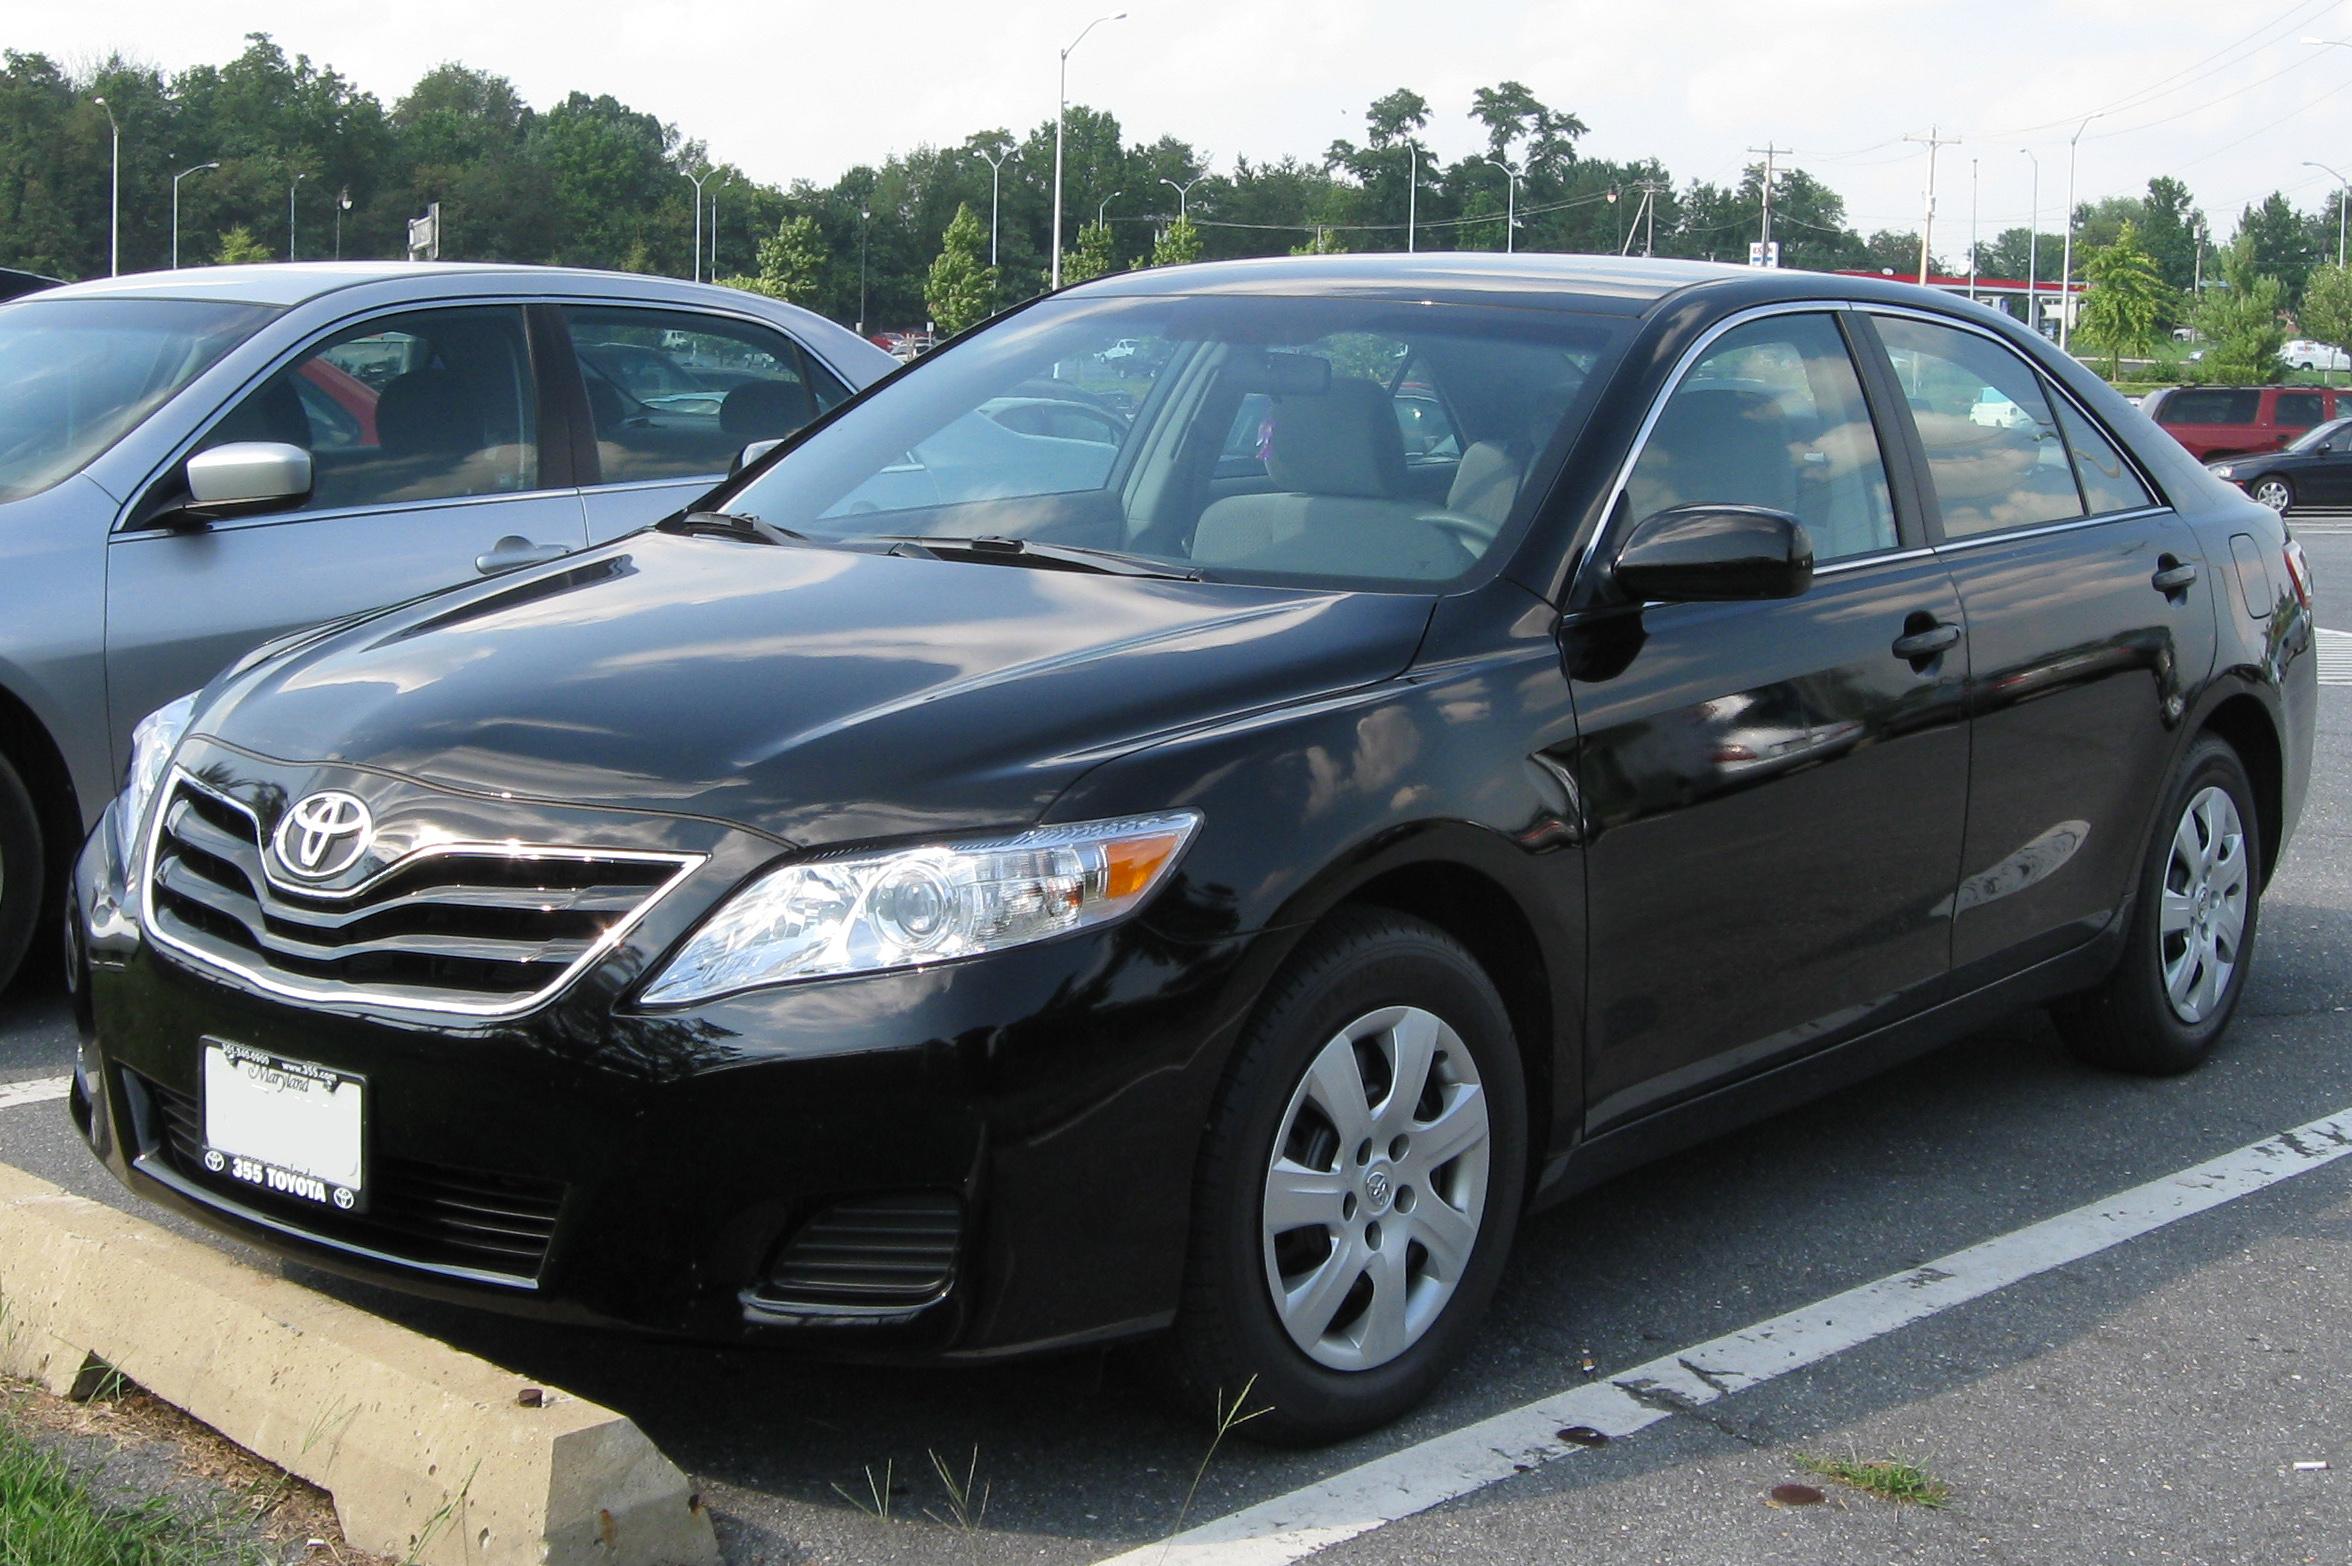 xle in nysportscars com toyota gray black car cars camry ash